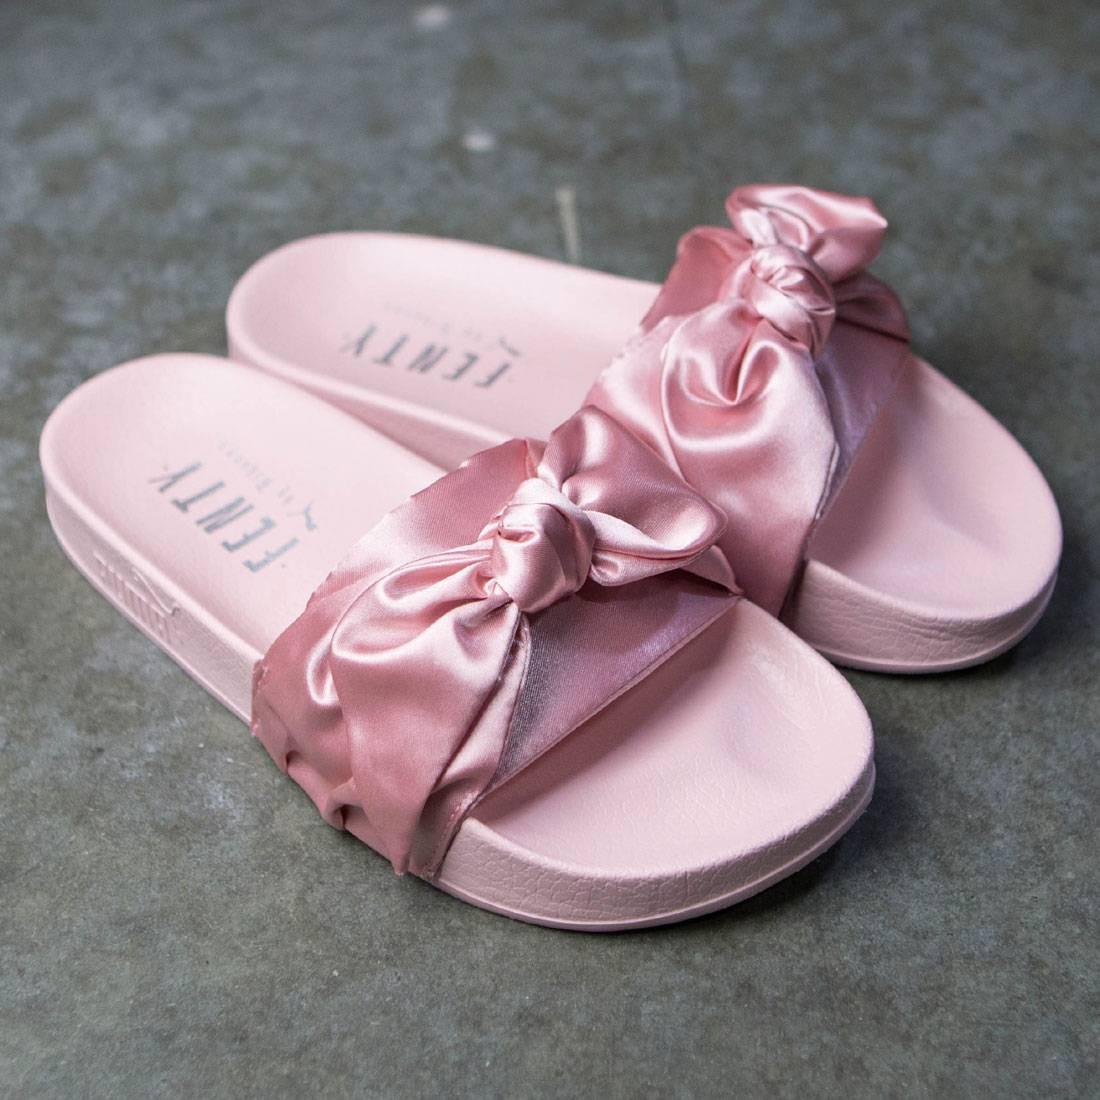 size 40 dc880 0004d Bow Slides για girly εμφανίσεις   Ι LOVE STYLE